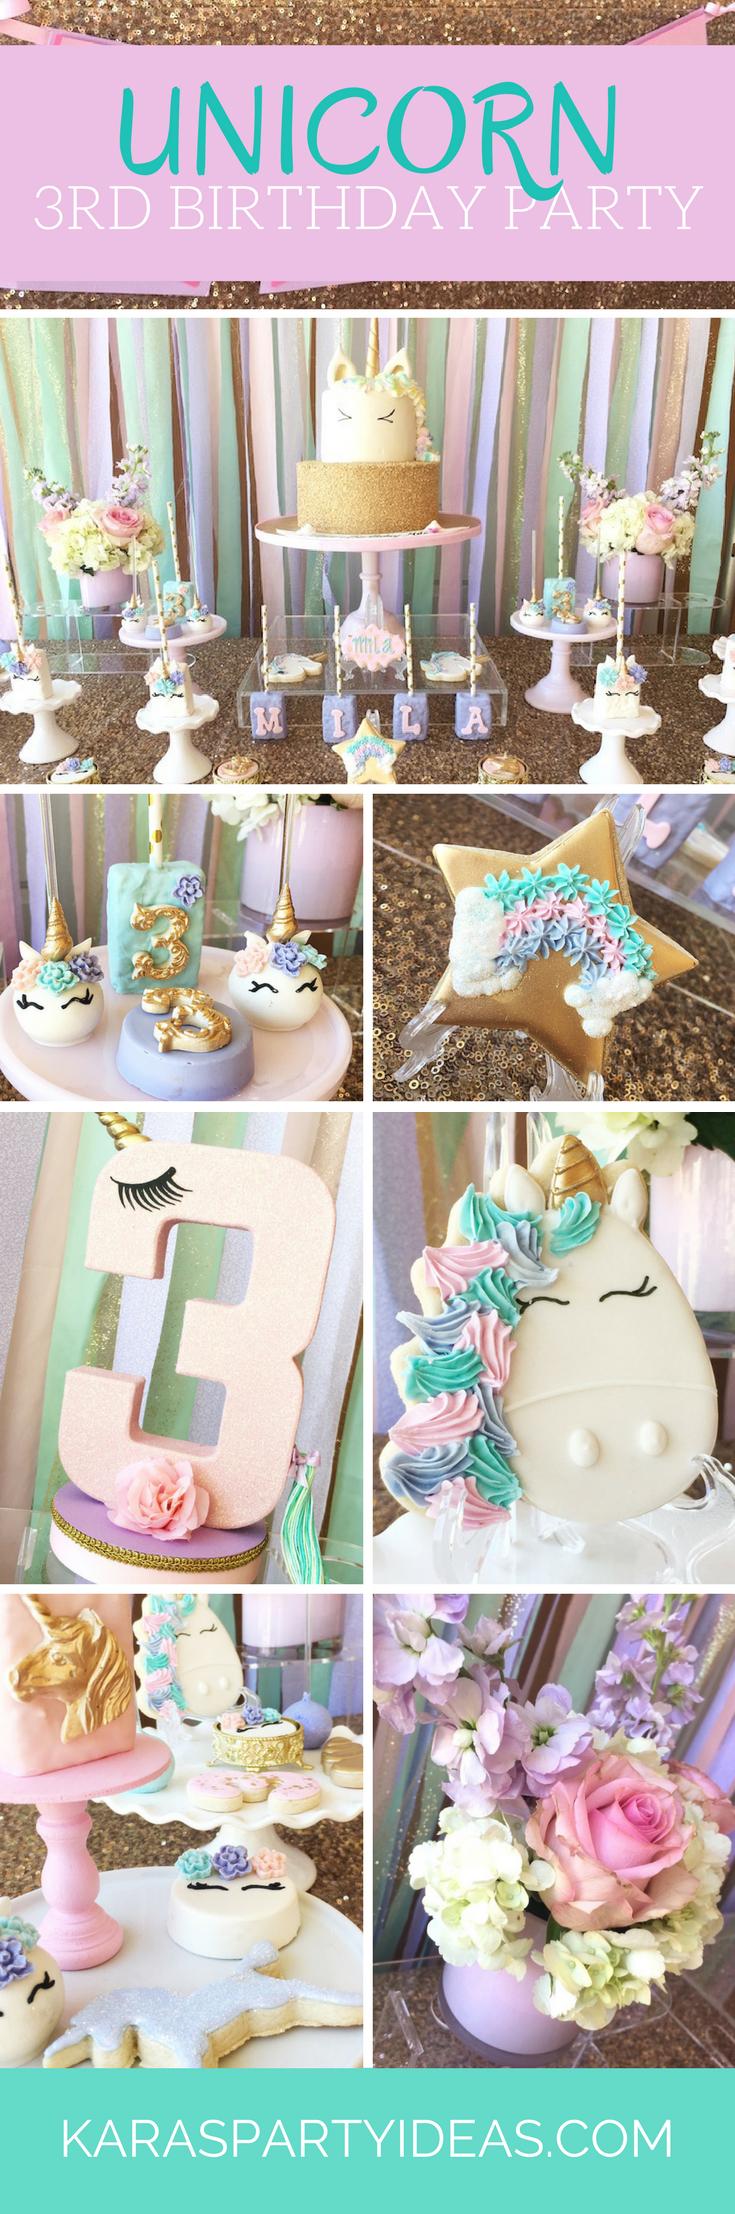 Unicorn 3rd Birthday Party via Kara's Party Ideas